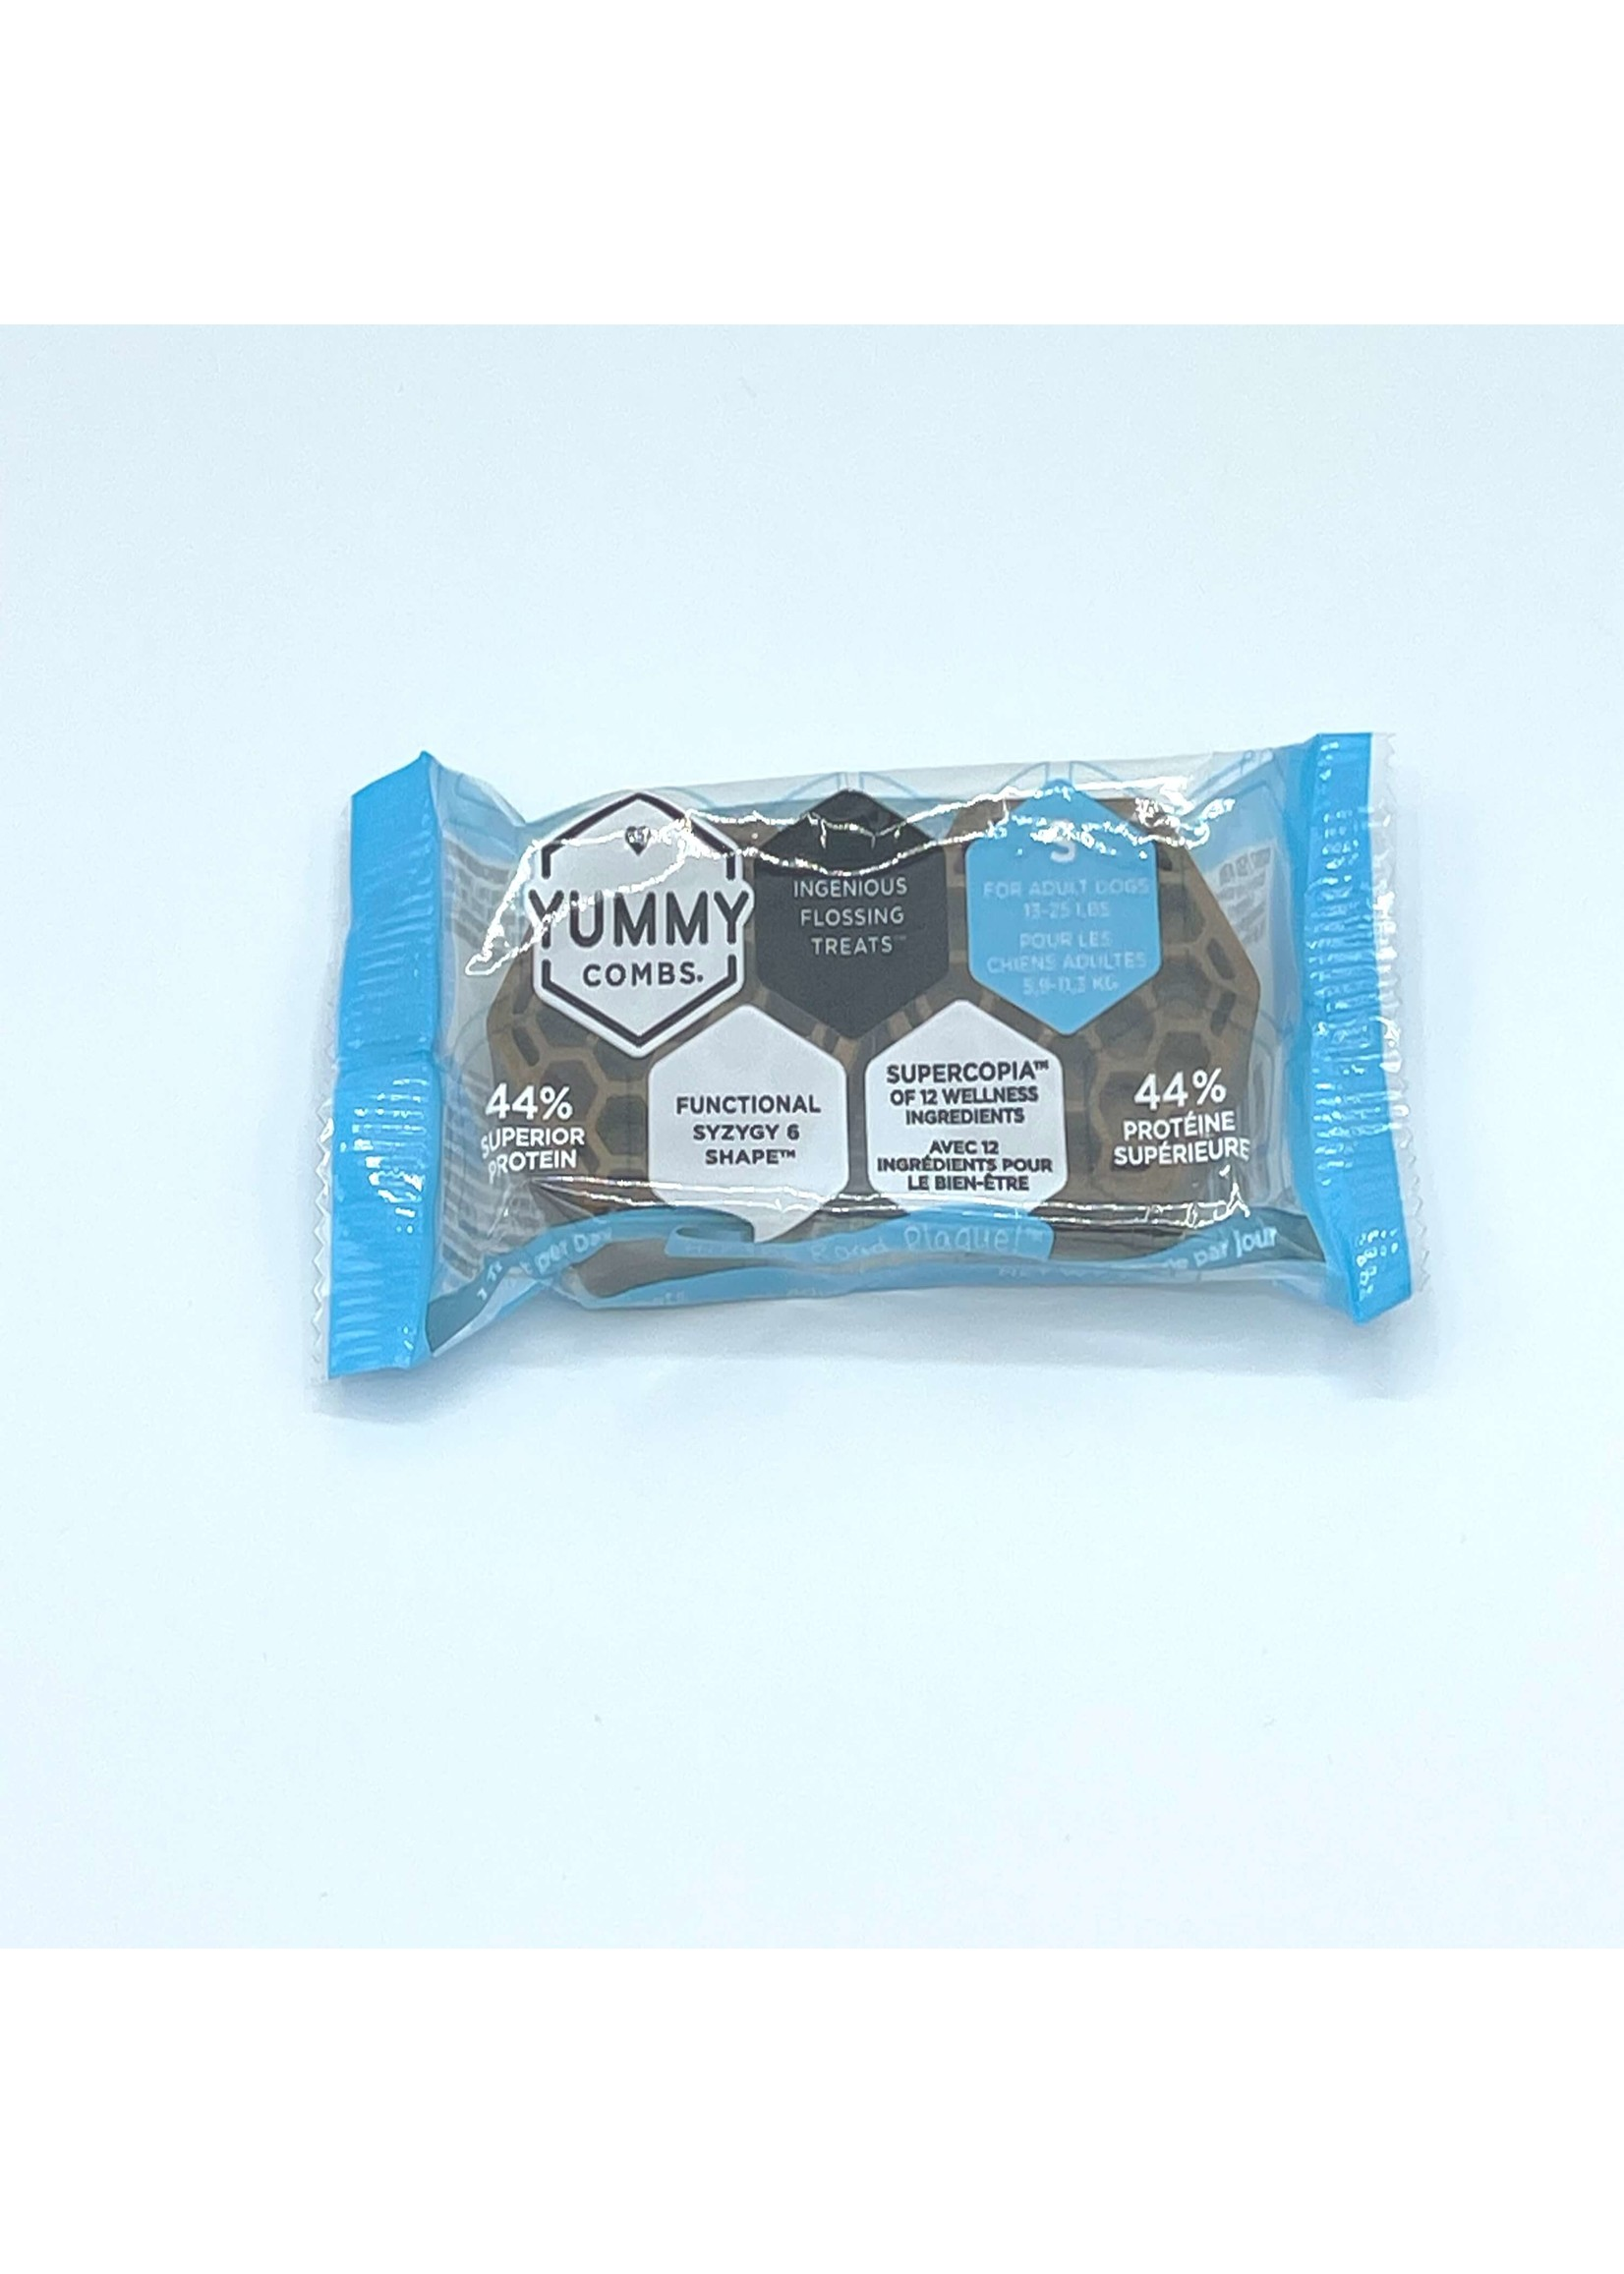 Yummy Combs Yummy Combs Dog Dental Chews